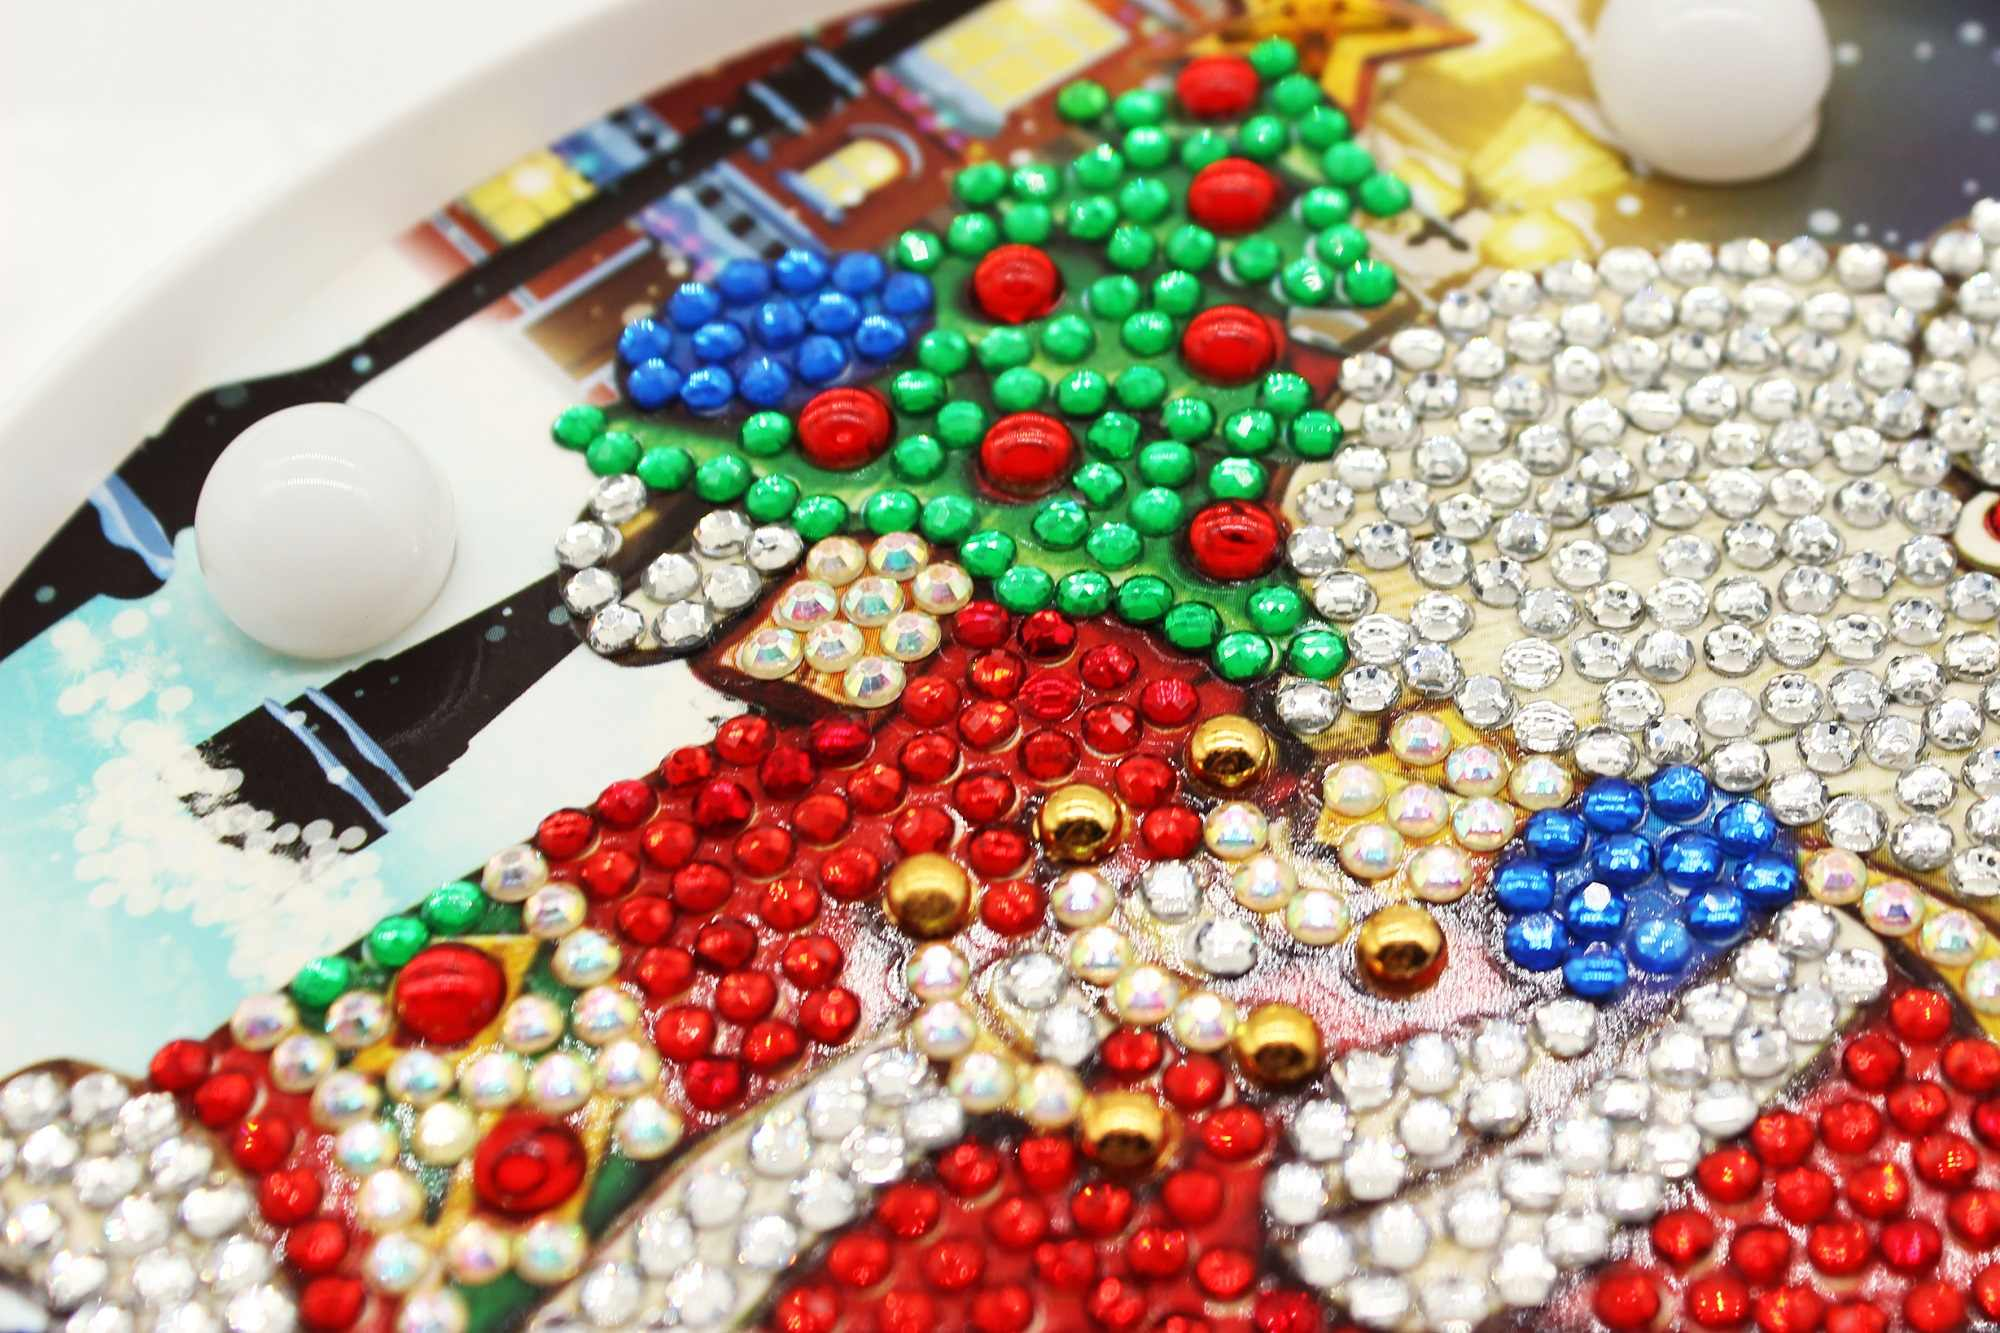 Hot Diy Diamond Embroidery Santa Claus Led Night Mini Light On Table Round Diamond Full Drill Christmas Gift For Friends ZXD050